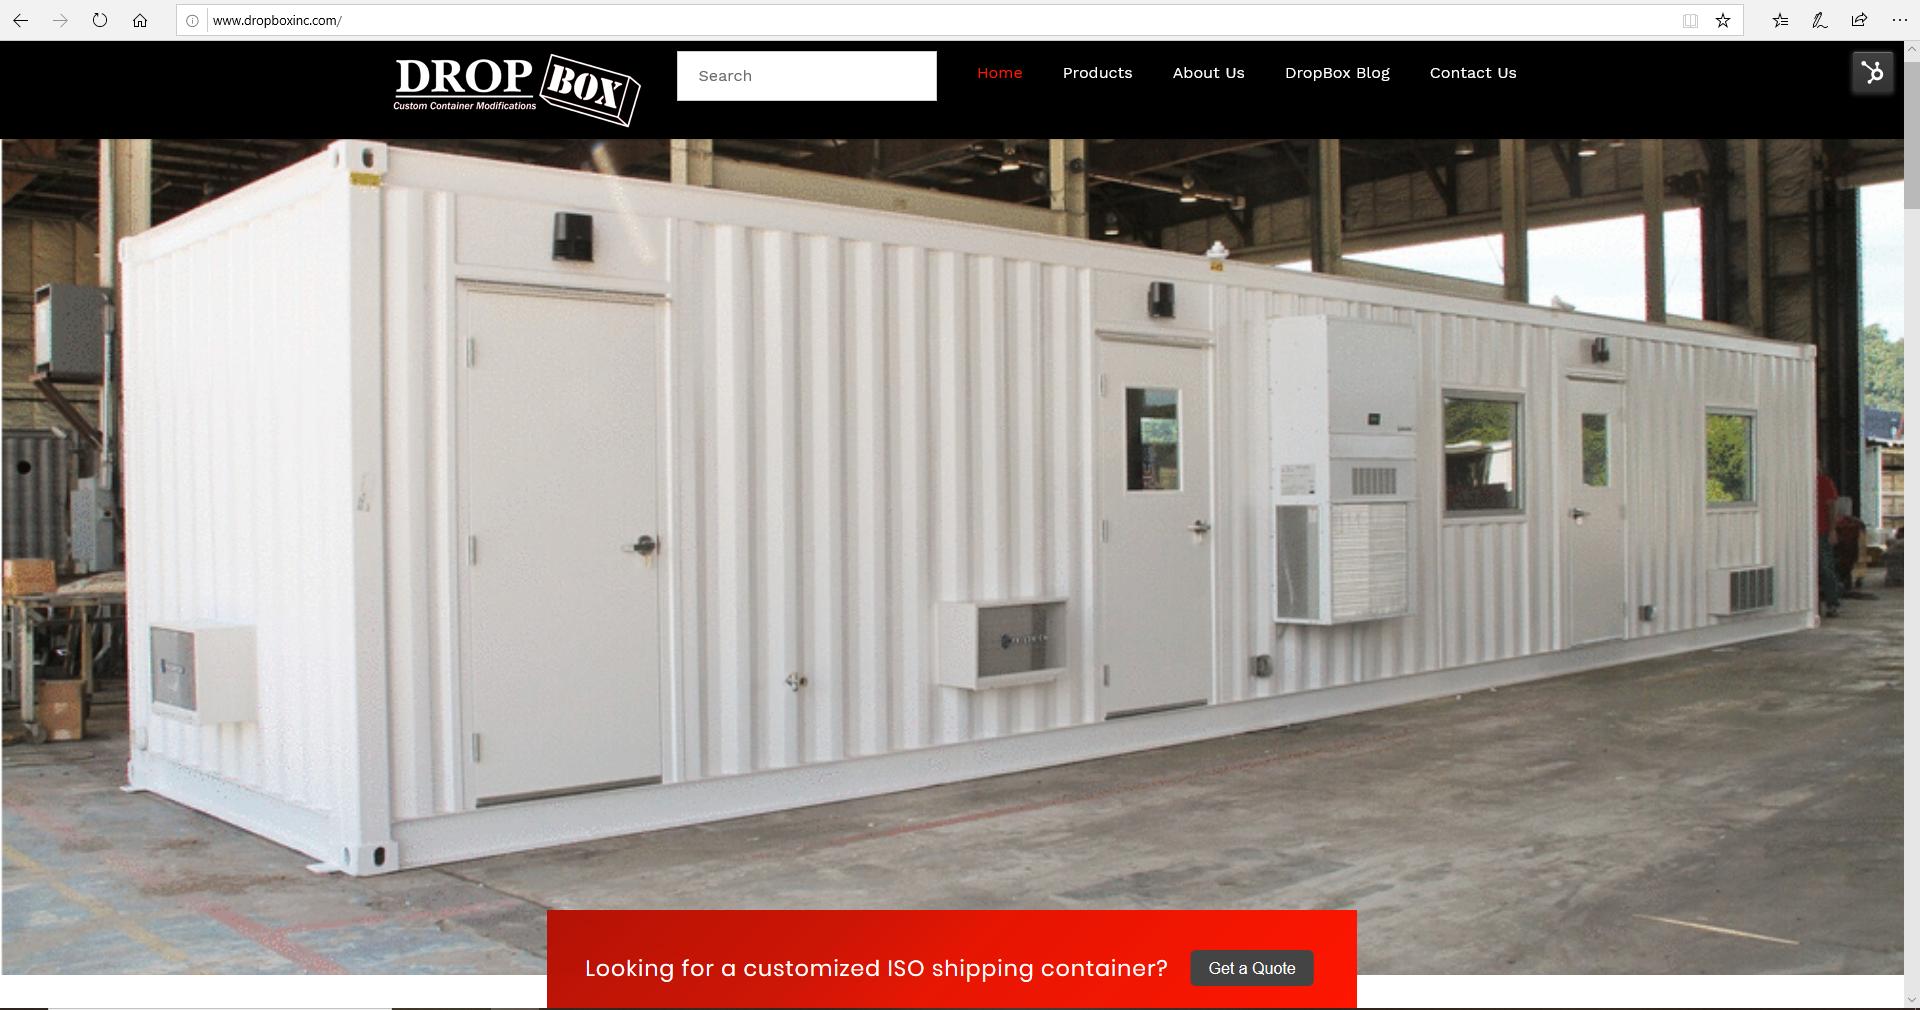 shipping container modification, DropBox Inc, dropboxinc.com, ReinventingTheBox